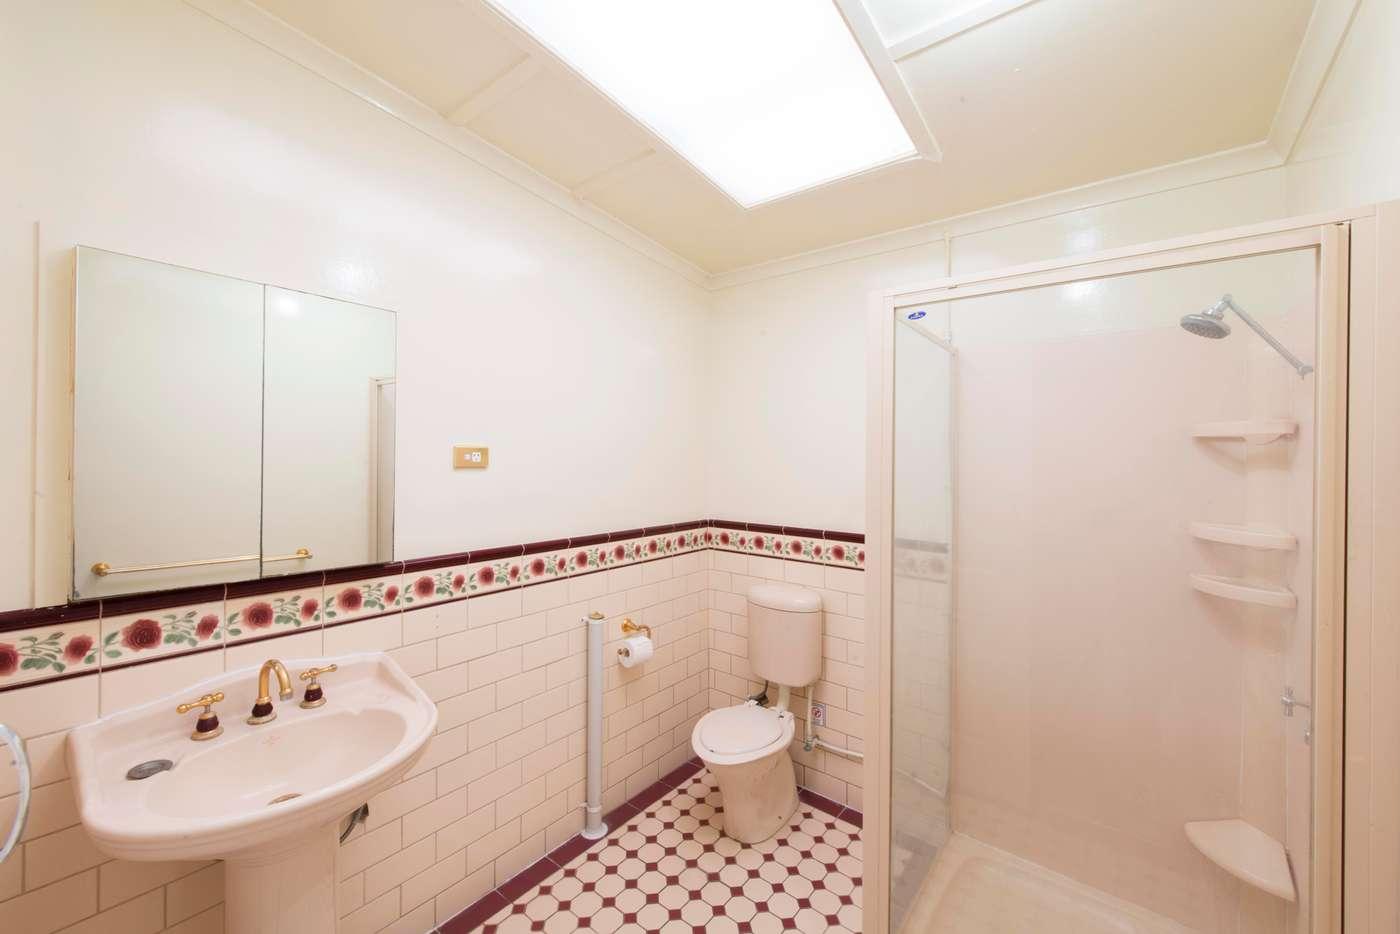 Sixth view of Homely house listing, 46 Marlene Street, Mount Gravatt East QLD 4122